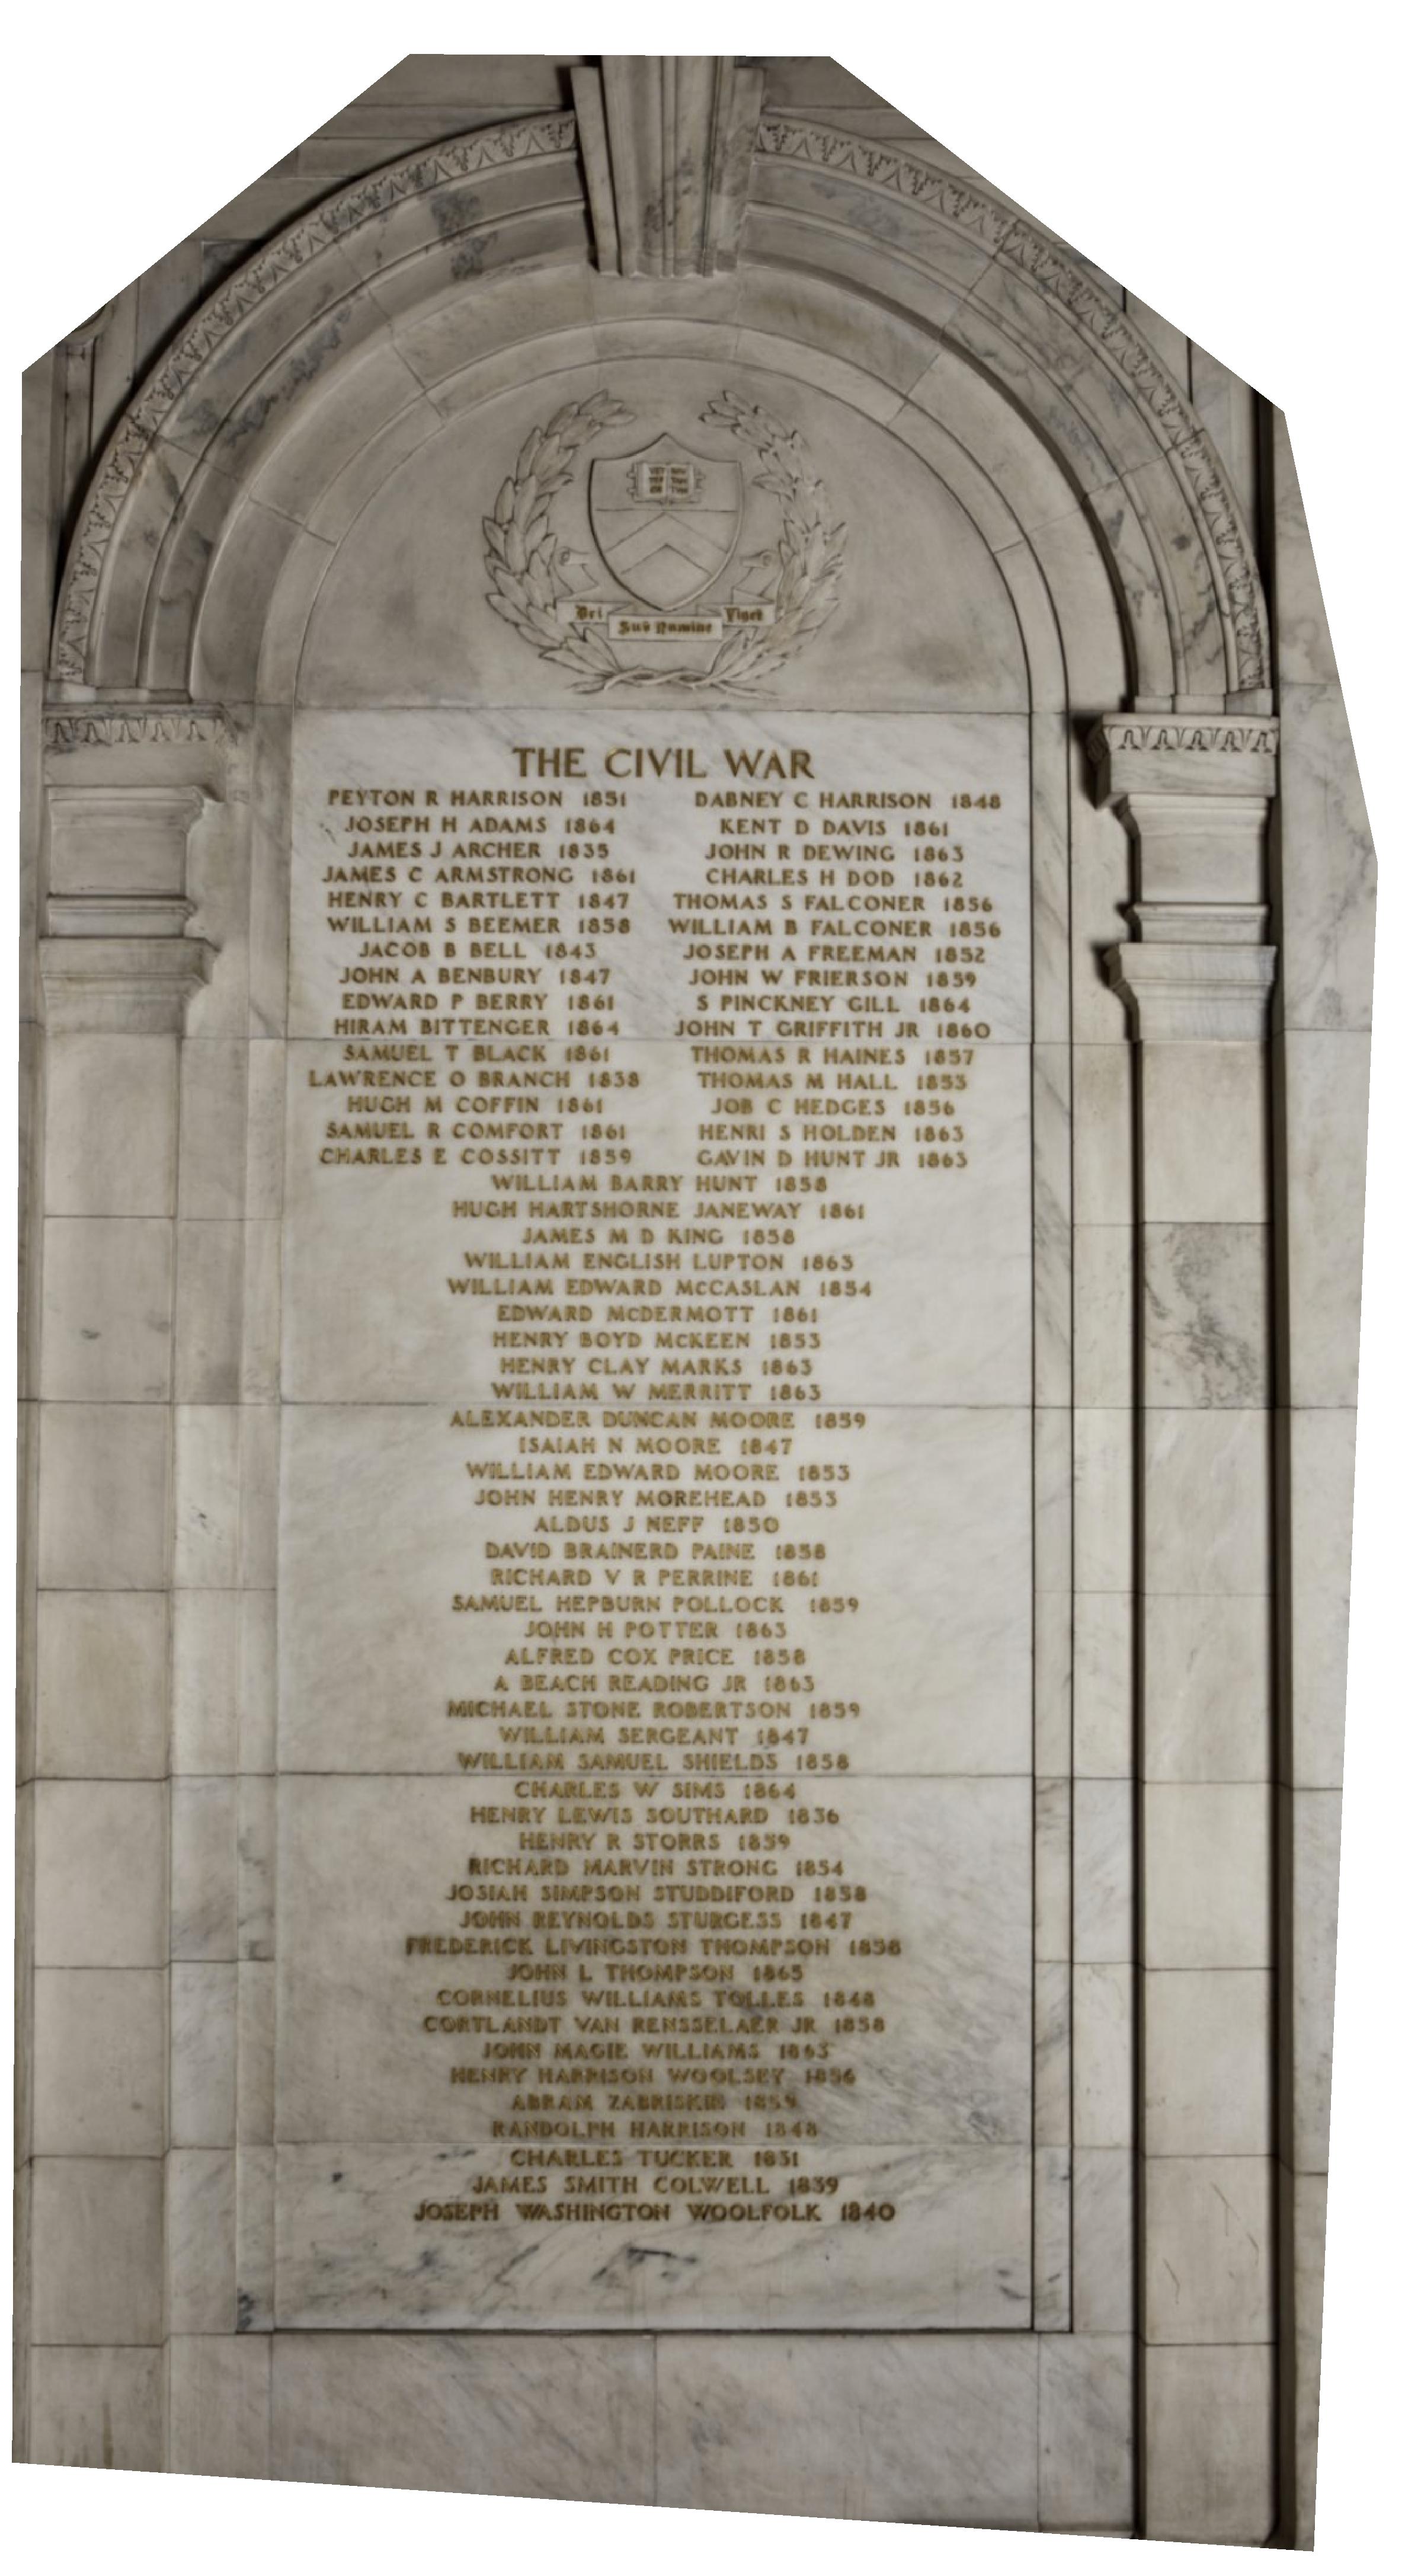 Princeton's Civil War Memorial in Nassau Hall.